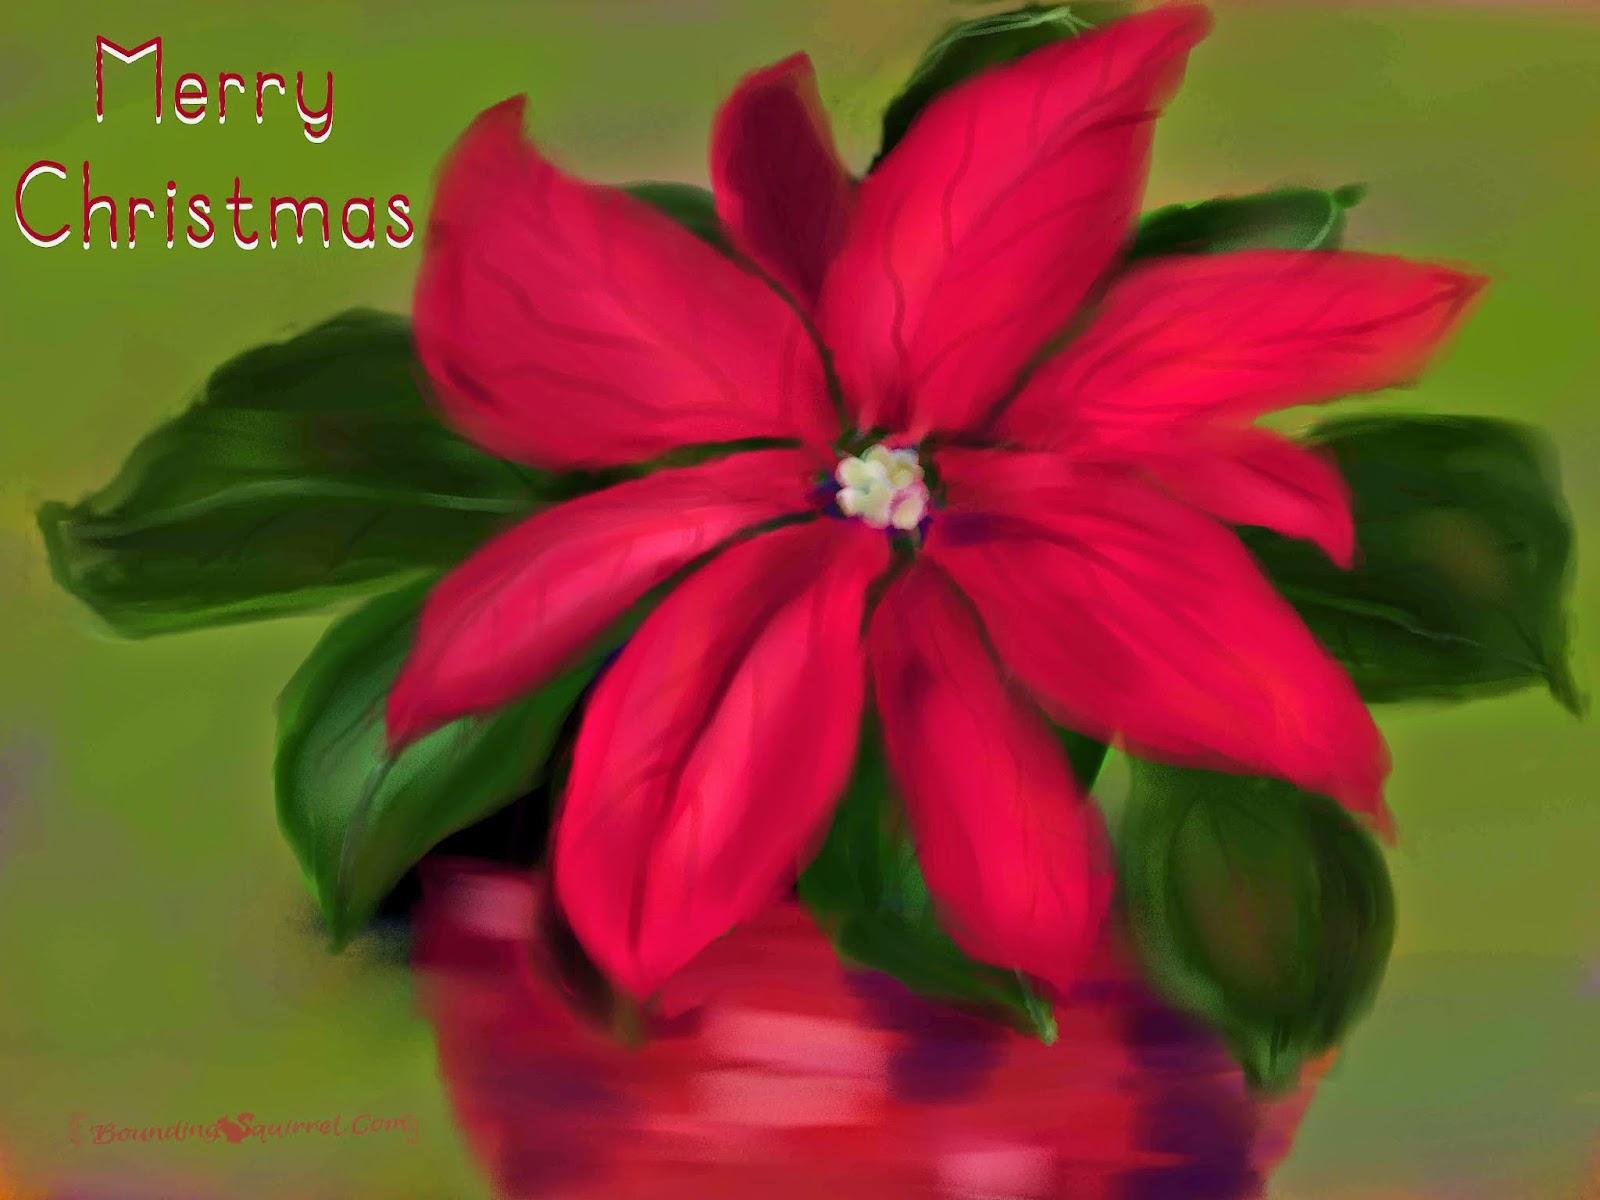 Merry Chistmas ecard-Poinsettia